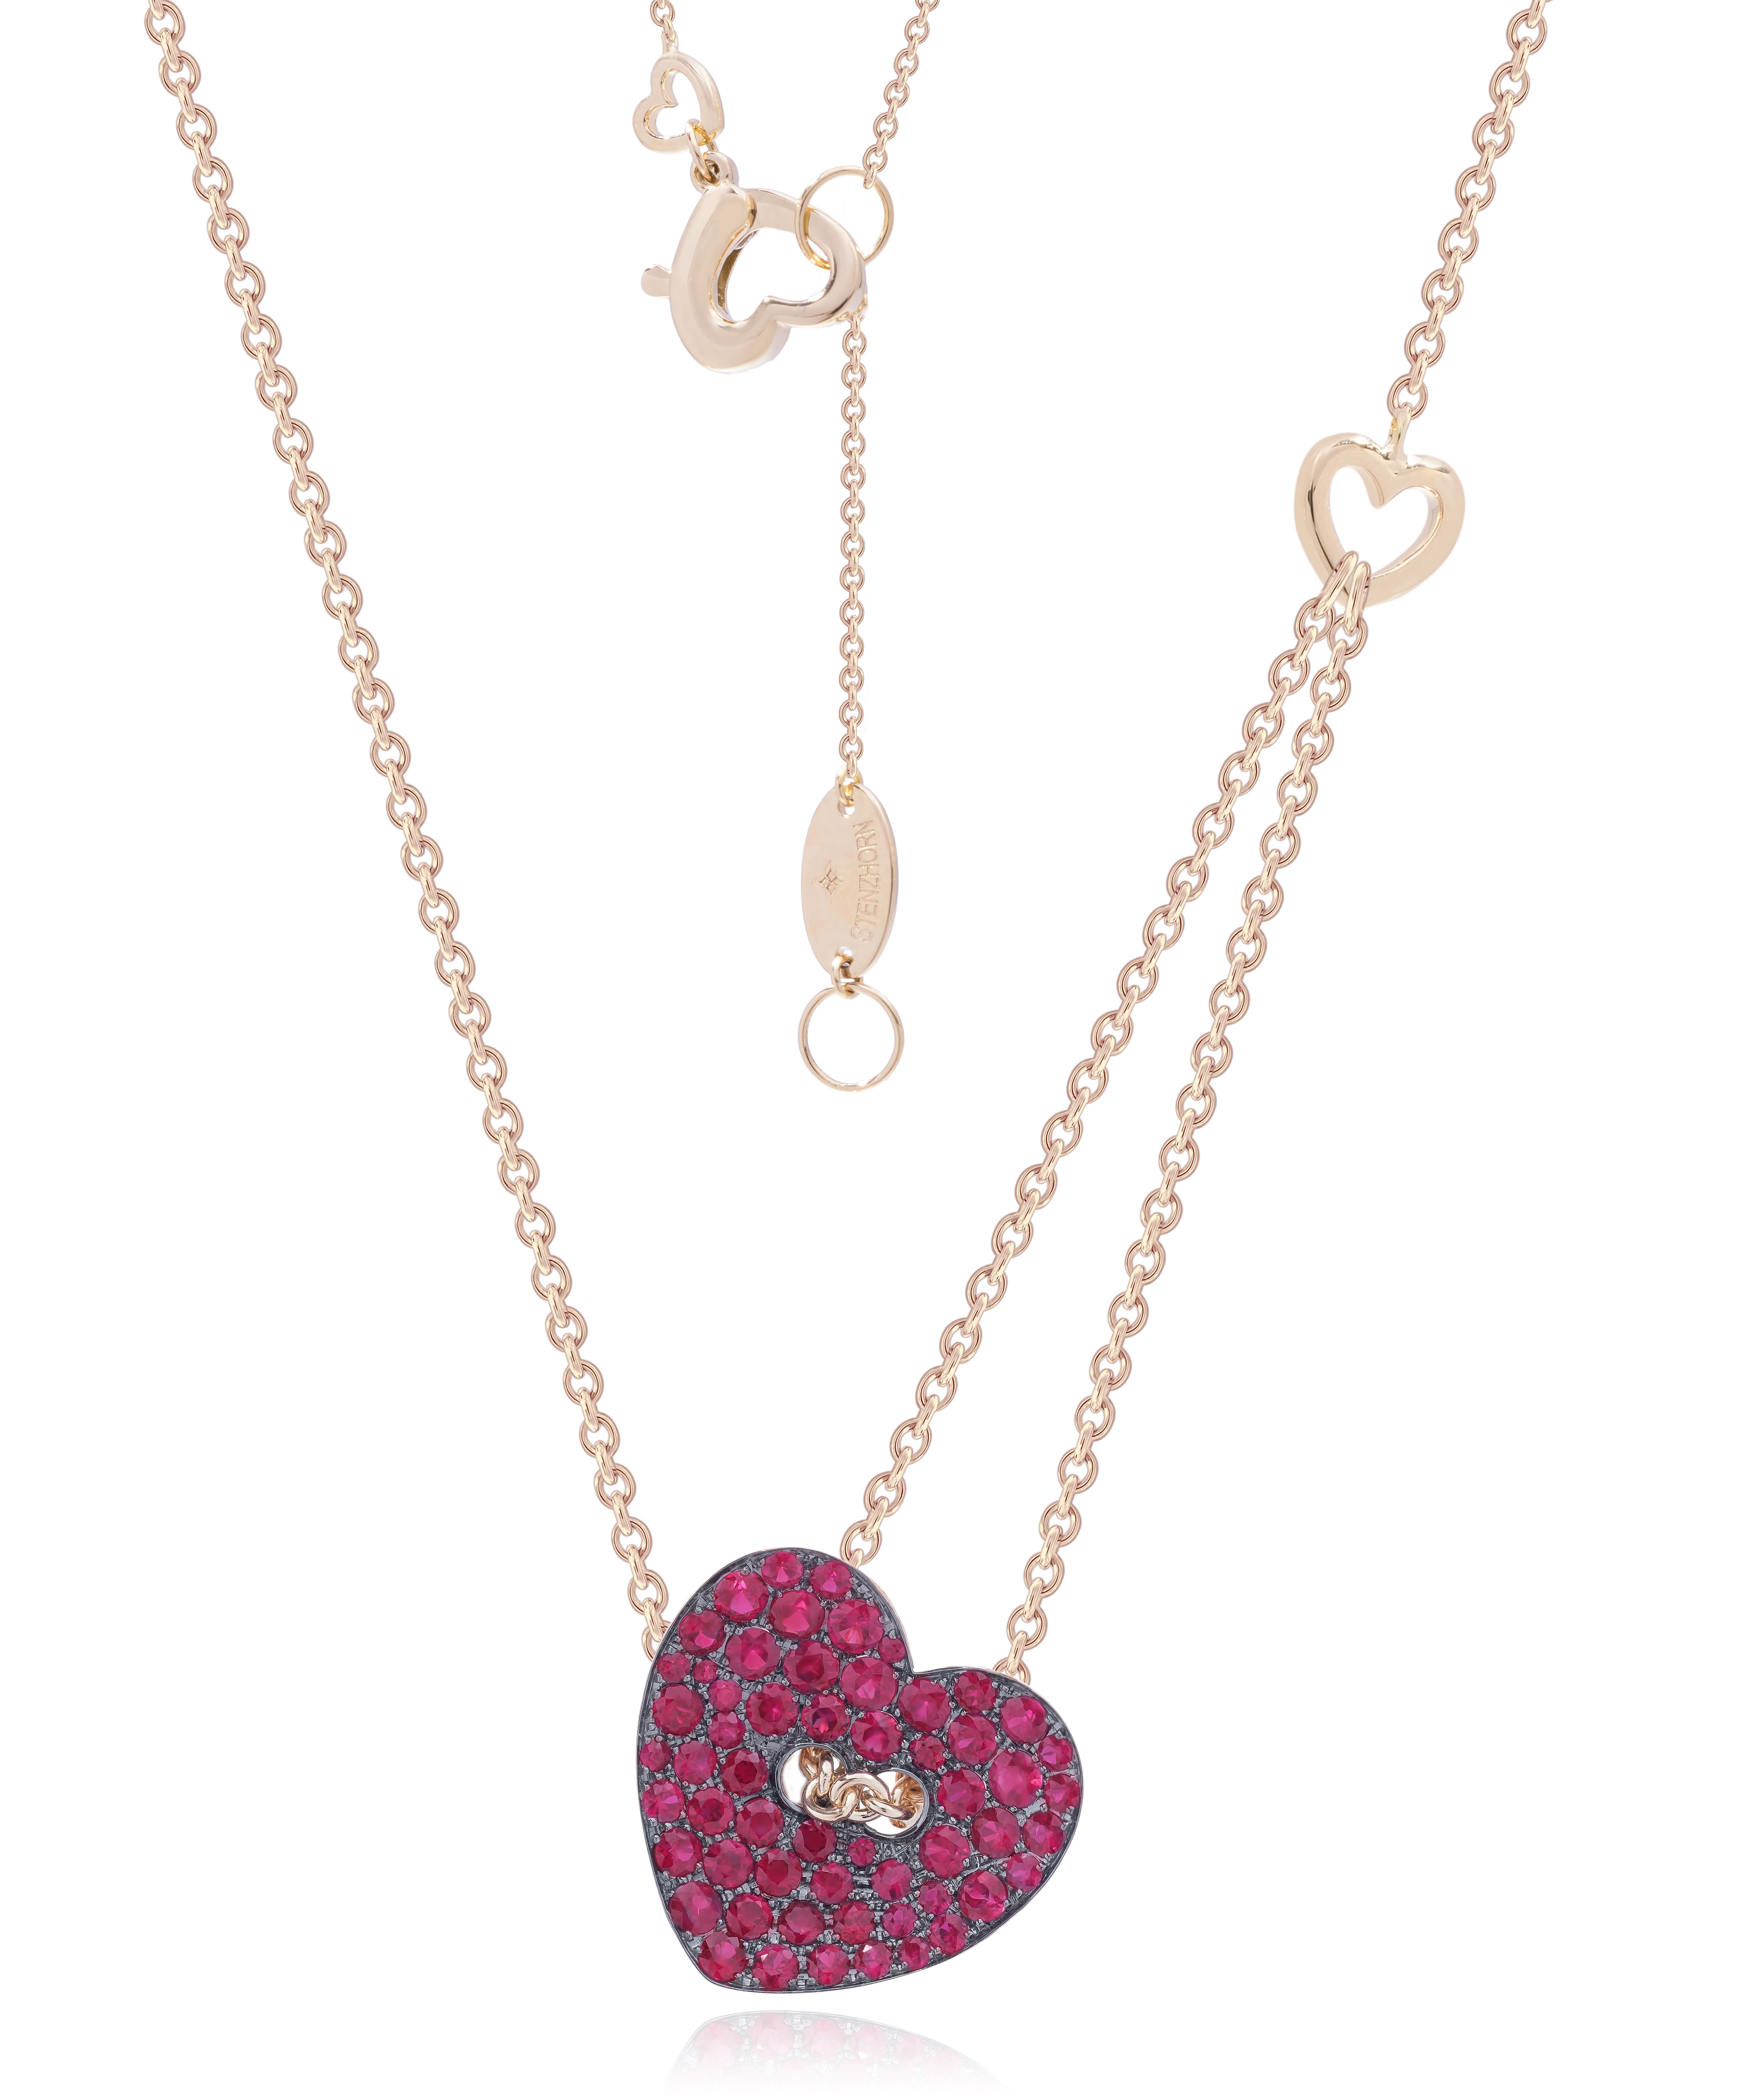 Chain my heart by Stenzhorn. Heart shape shirt button pendant in ...